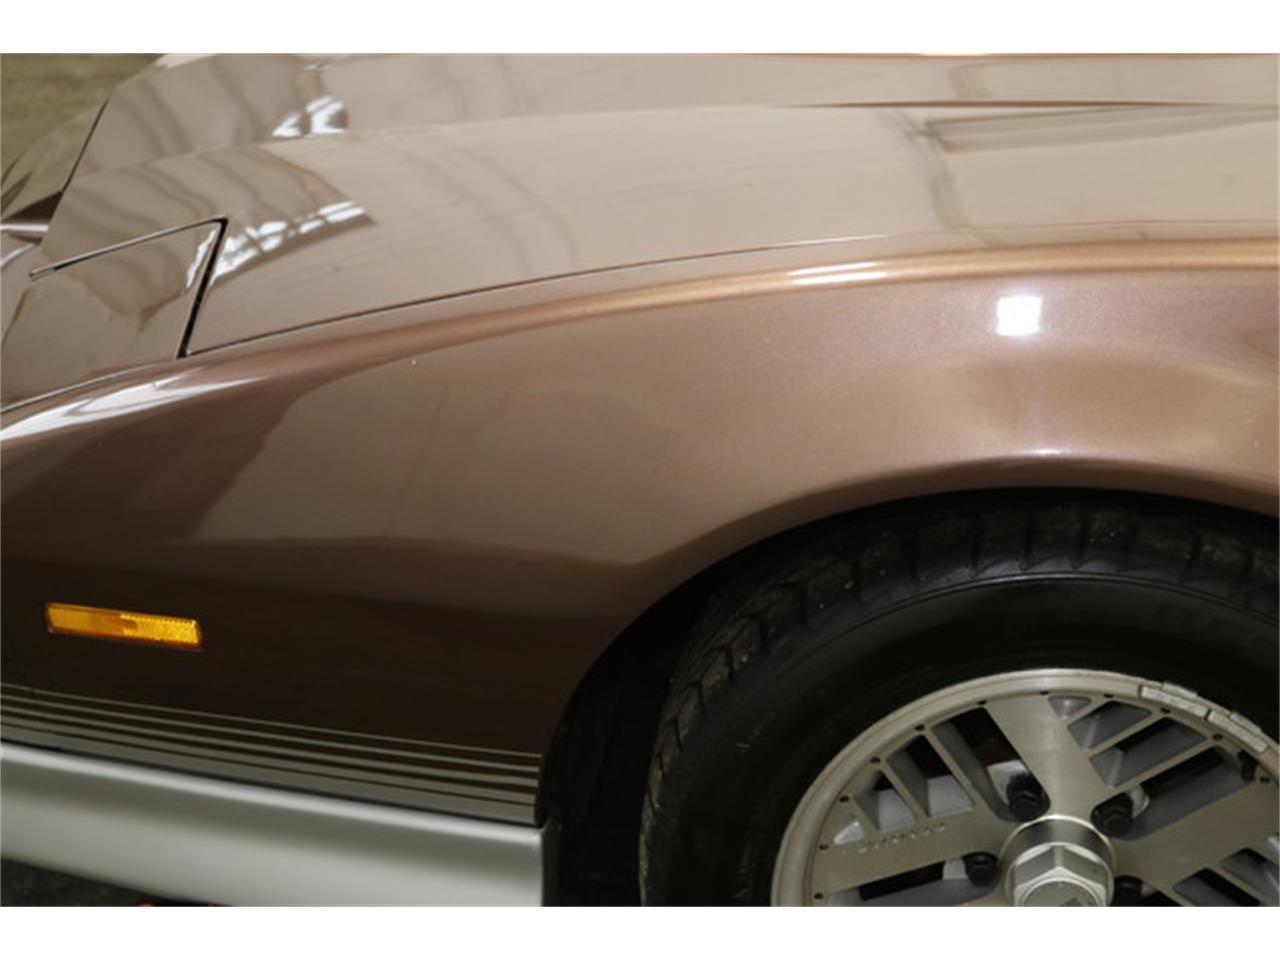 1984 pontiac firebird trans am for sale classiccars com cc 947454 1984 pontiac firebird trans am for sale